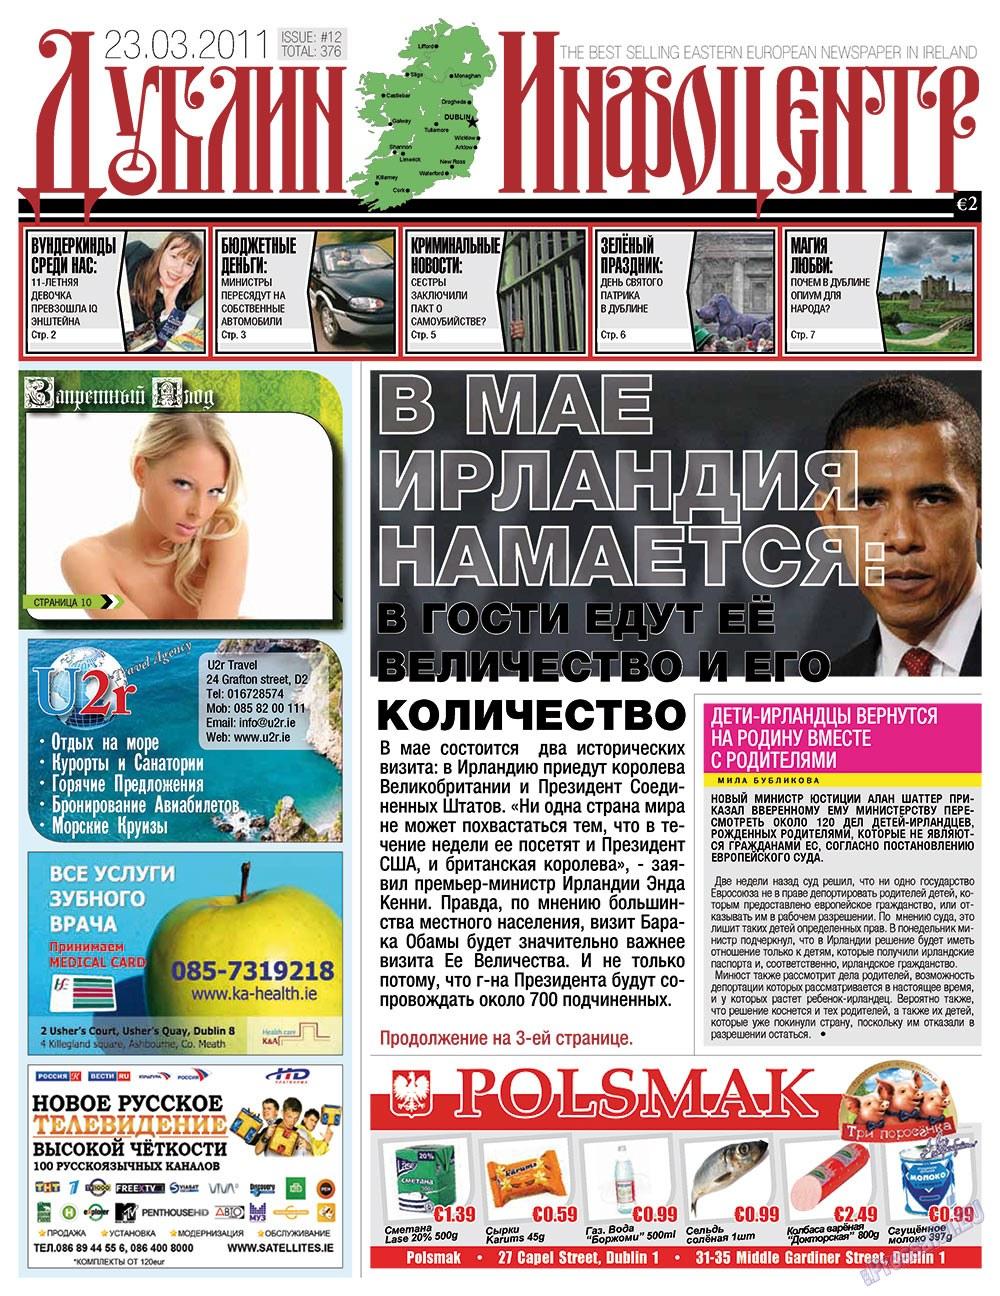 Дублин инфоцентр (газета). 2011 год, номер 12, стр. 1